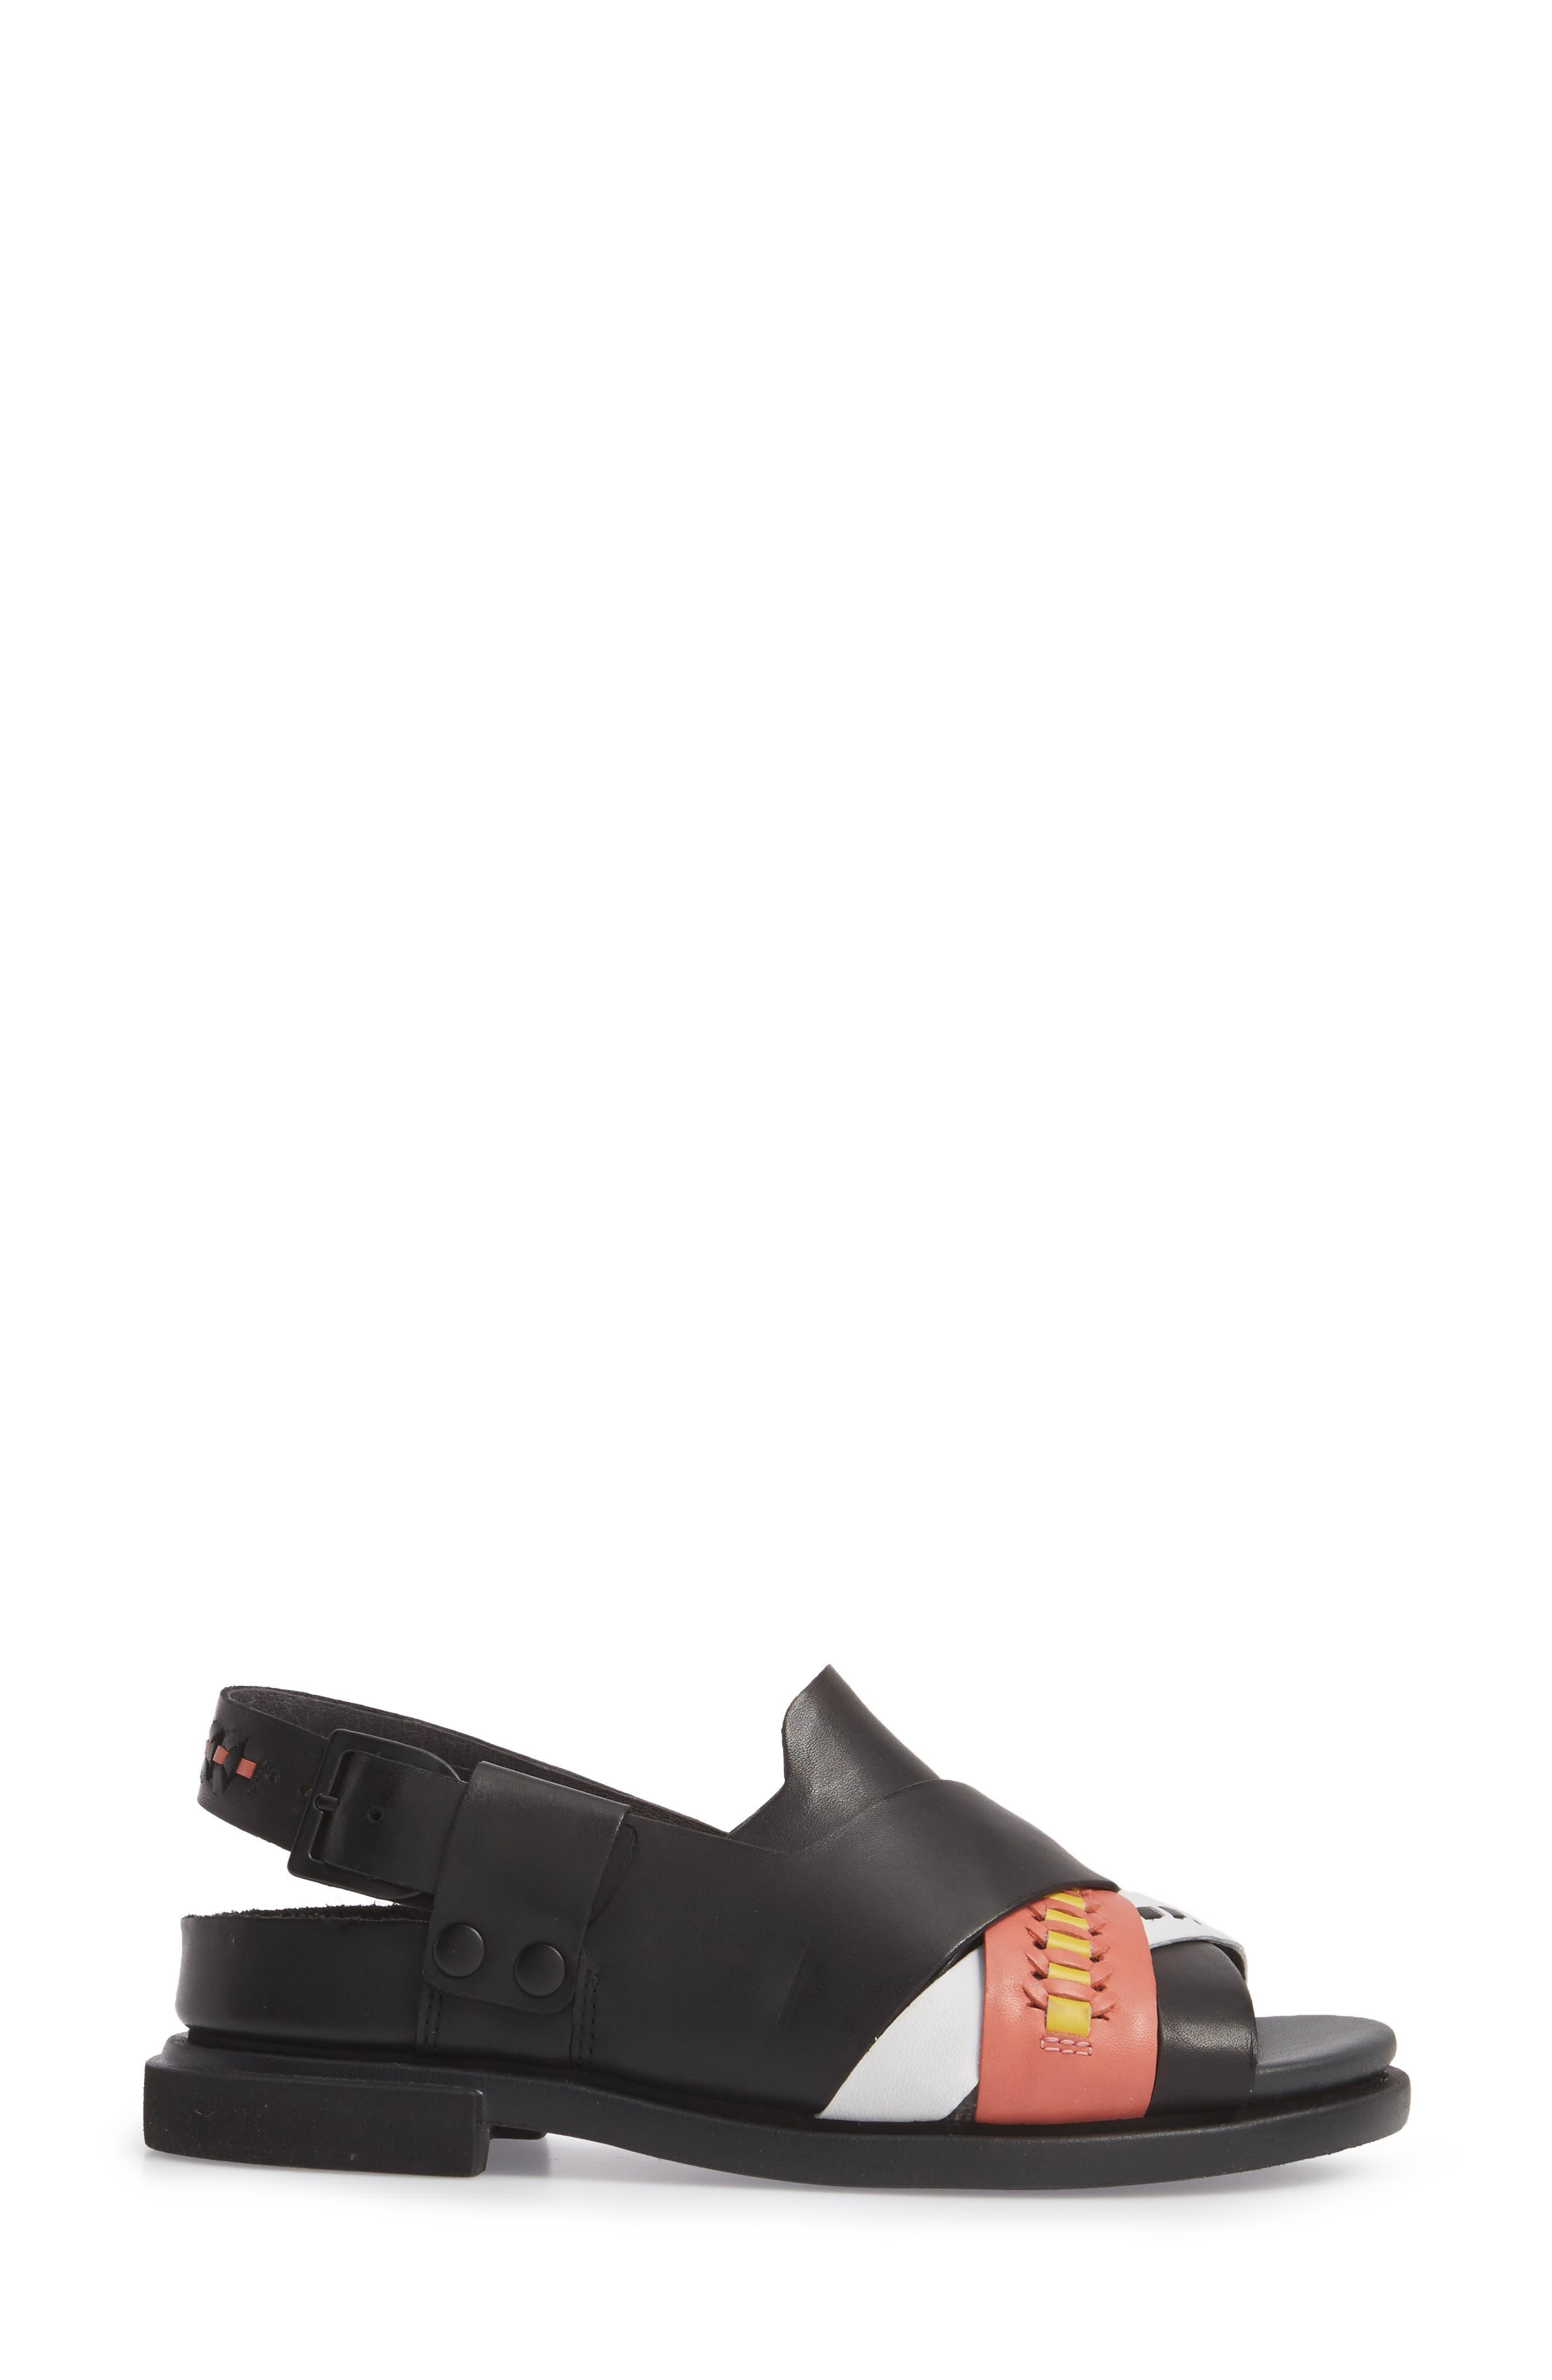 Twins Slingback Sandal,                             Alternate thumbnail 5, color,                             Multi - Assorted Leather